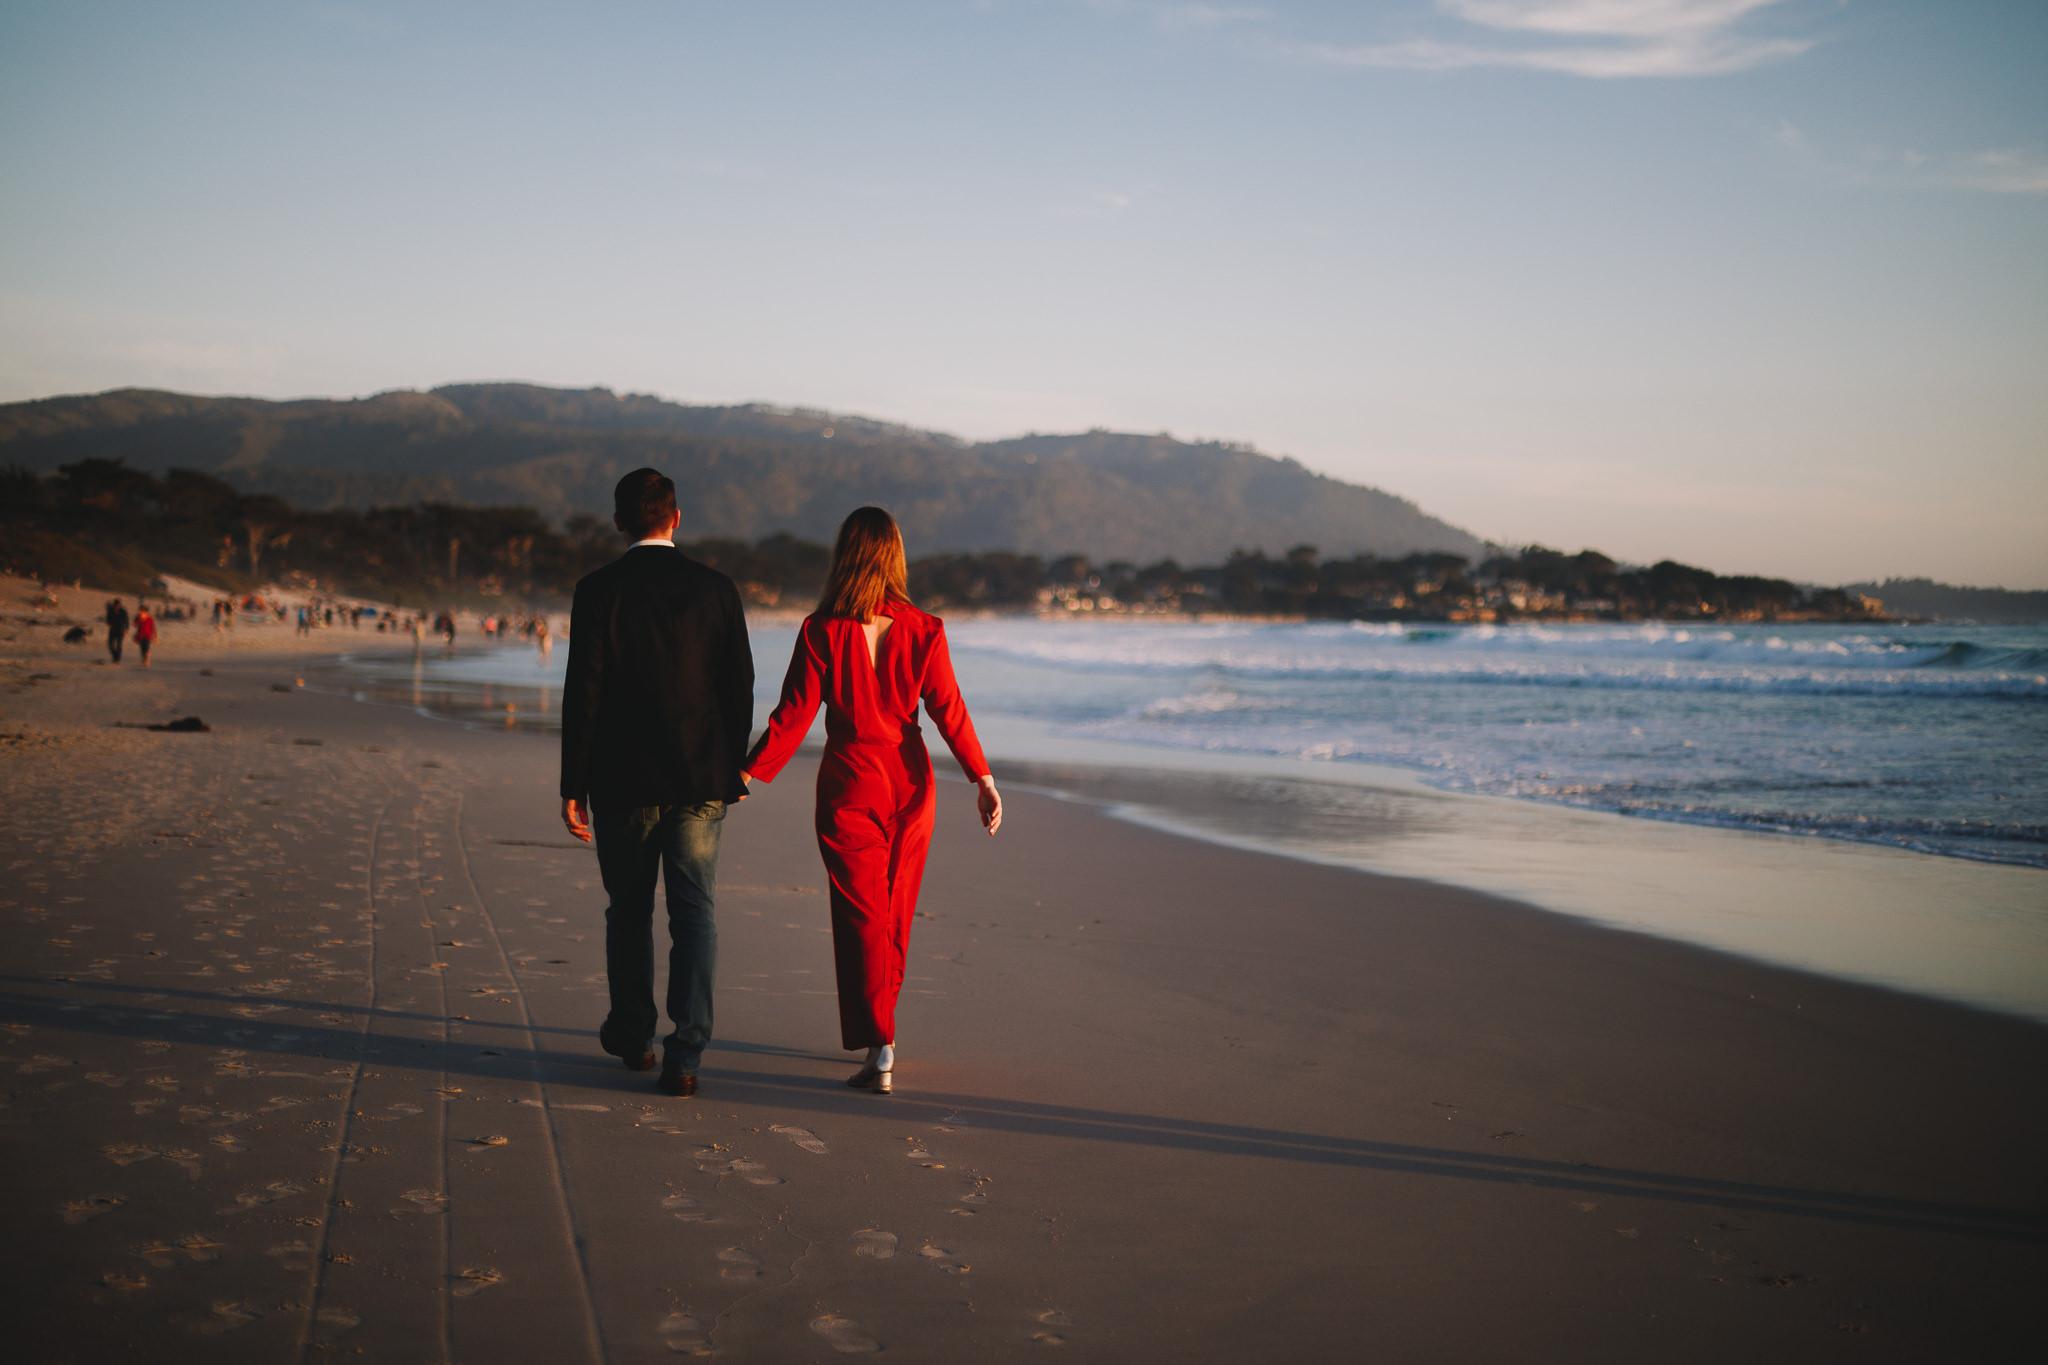 Archer Inspired Photography Carmel Beach California Wedding Engagement Lifestyle Anniversary Natural Light Photographer-34.jpg